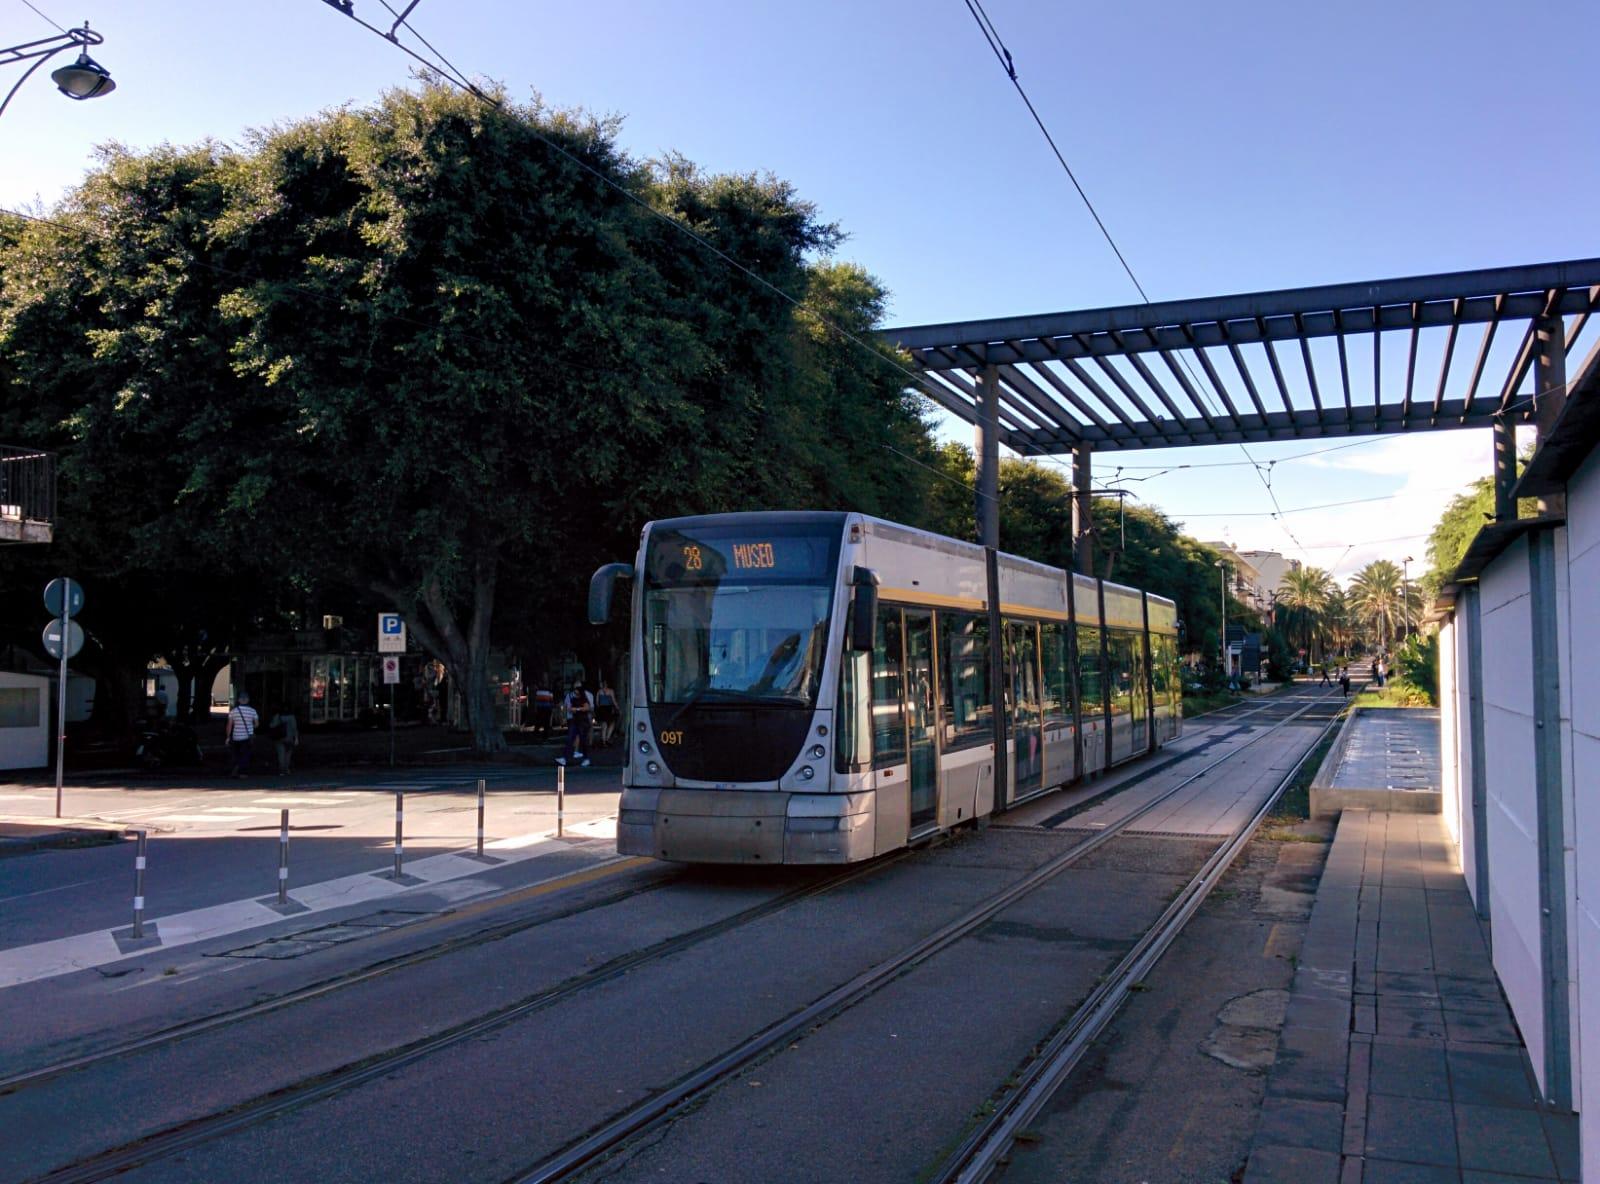 foto del tram di messina, piazza cairoli